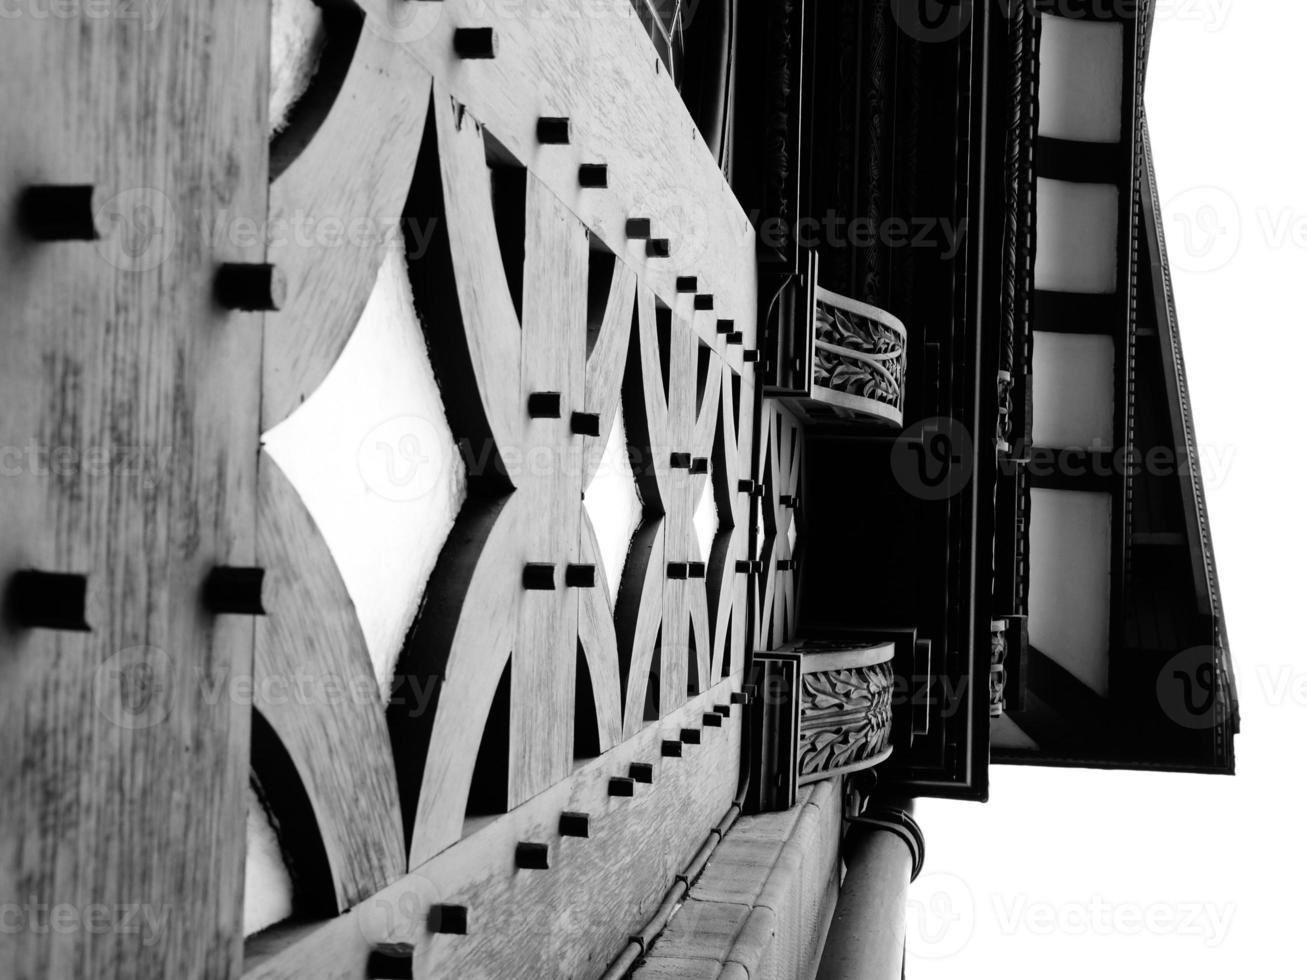 architettura tudor inghilterra chester foto